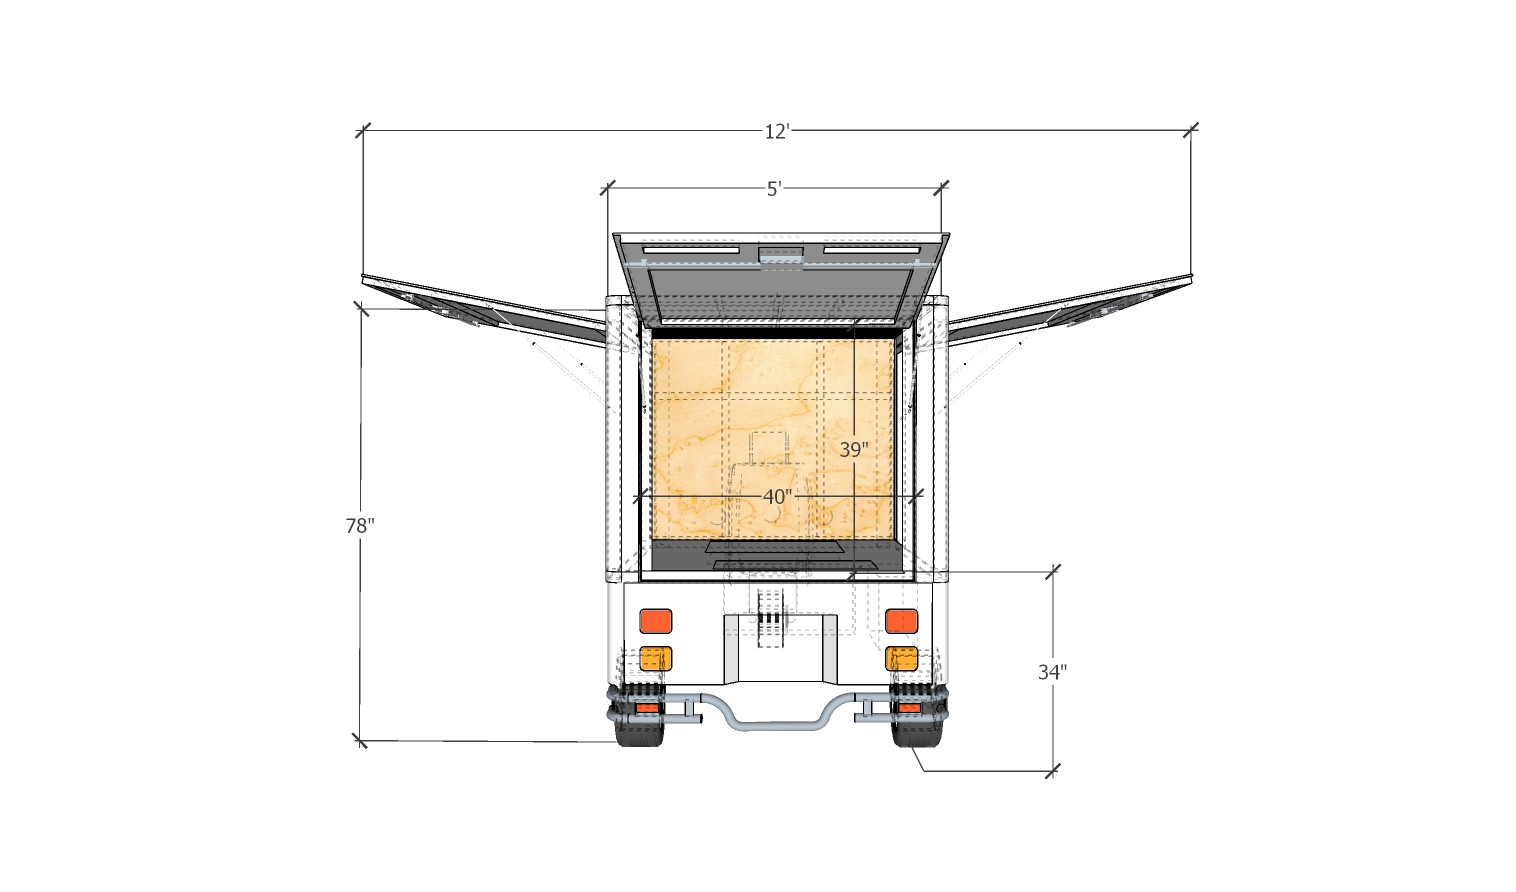 TukFab-VehicleDimensions-Vendor-Rear.jpg